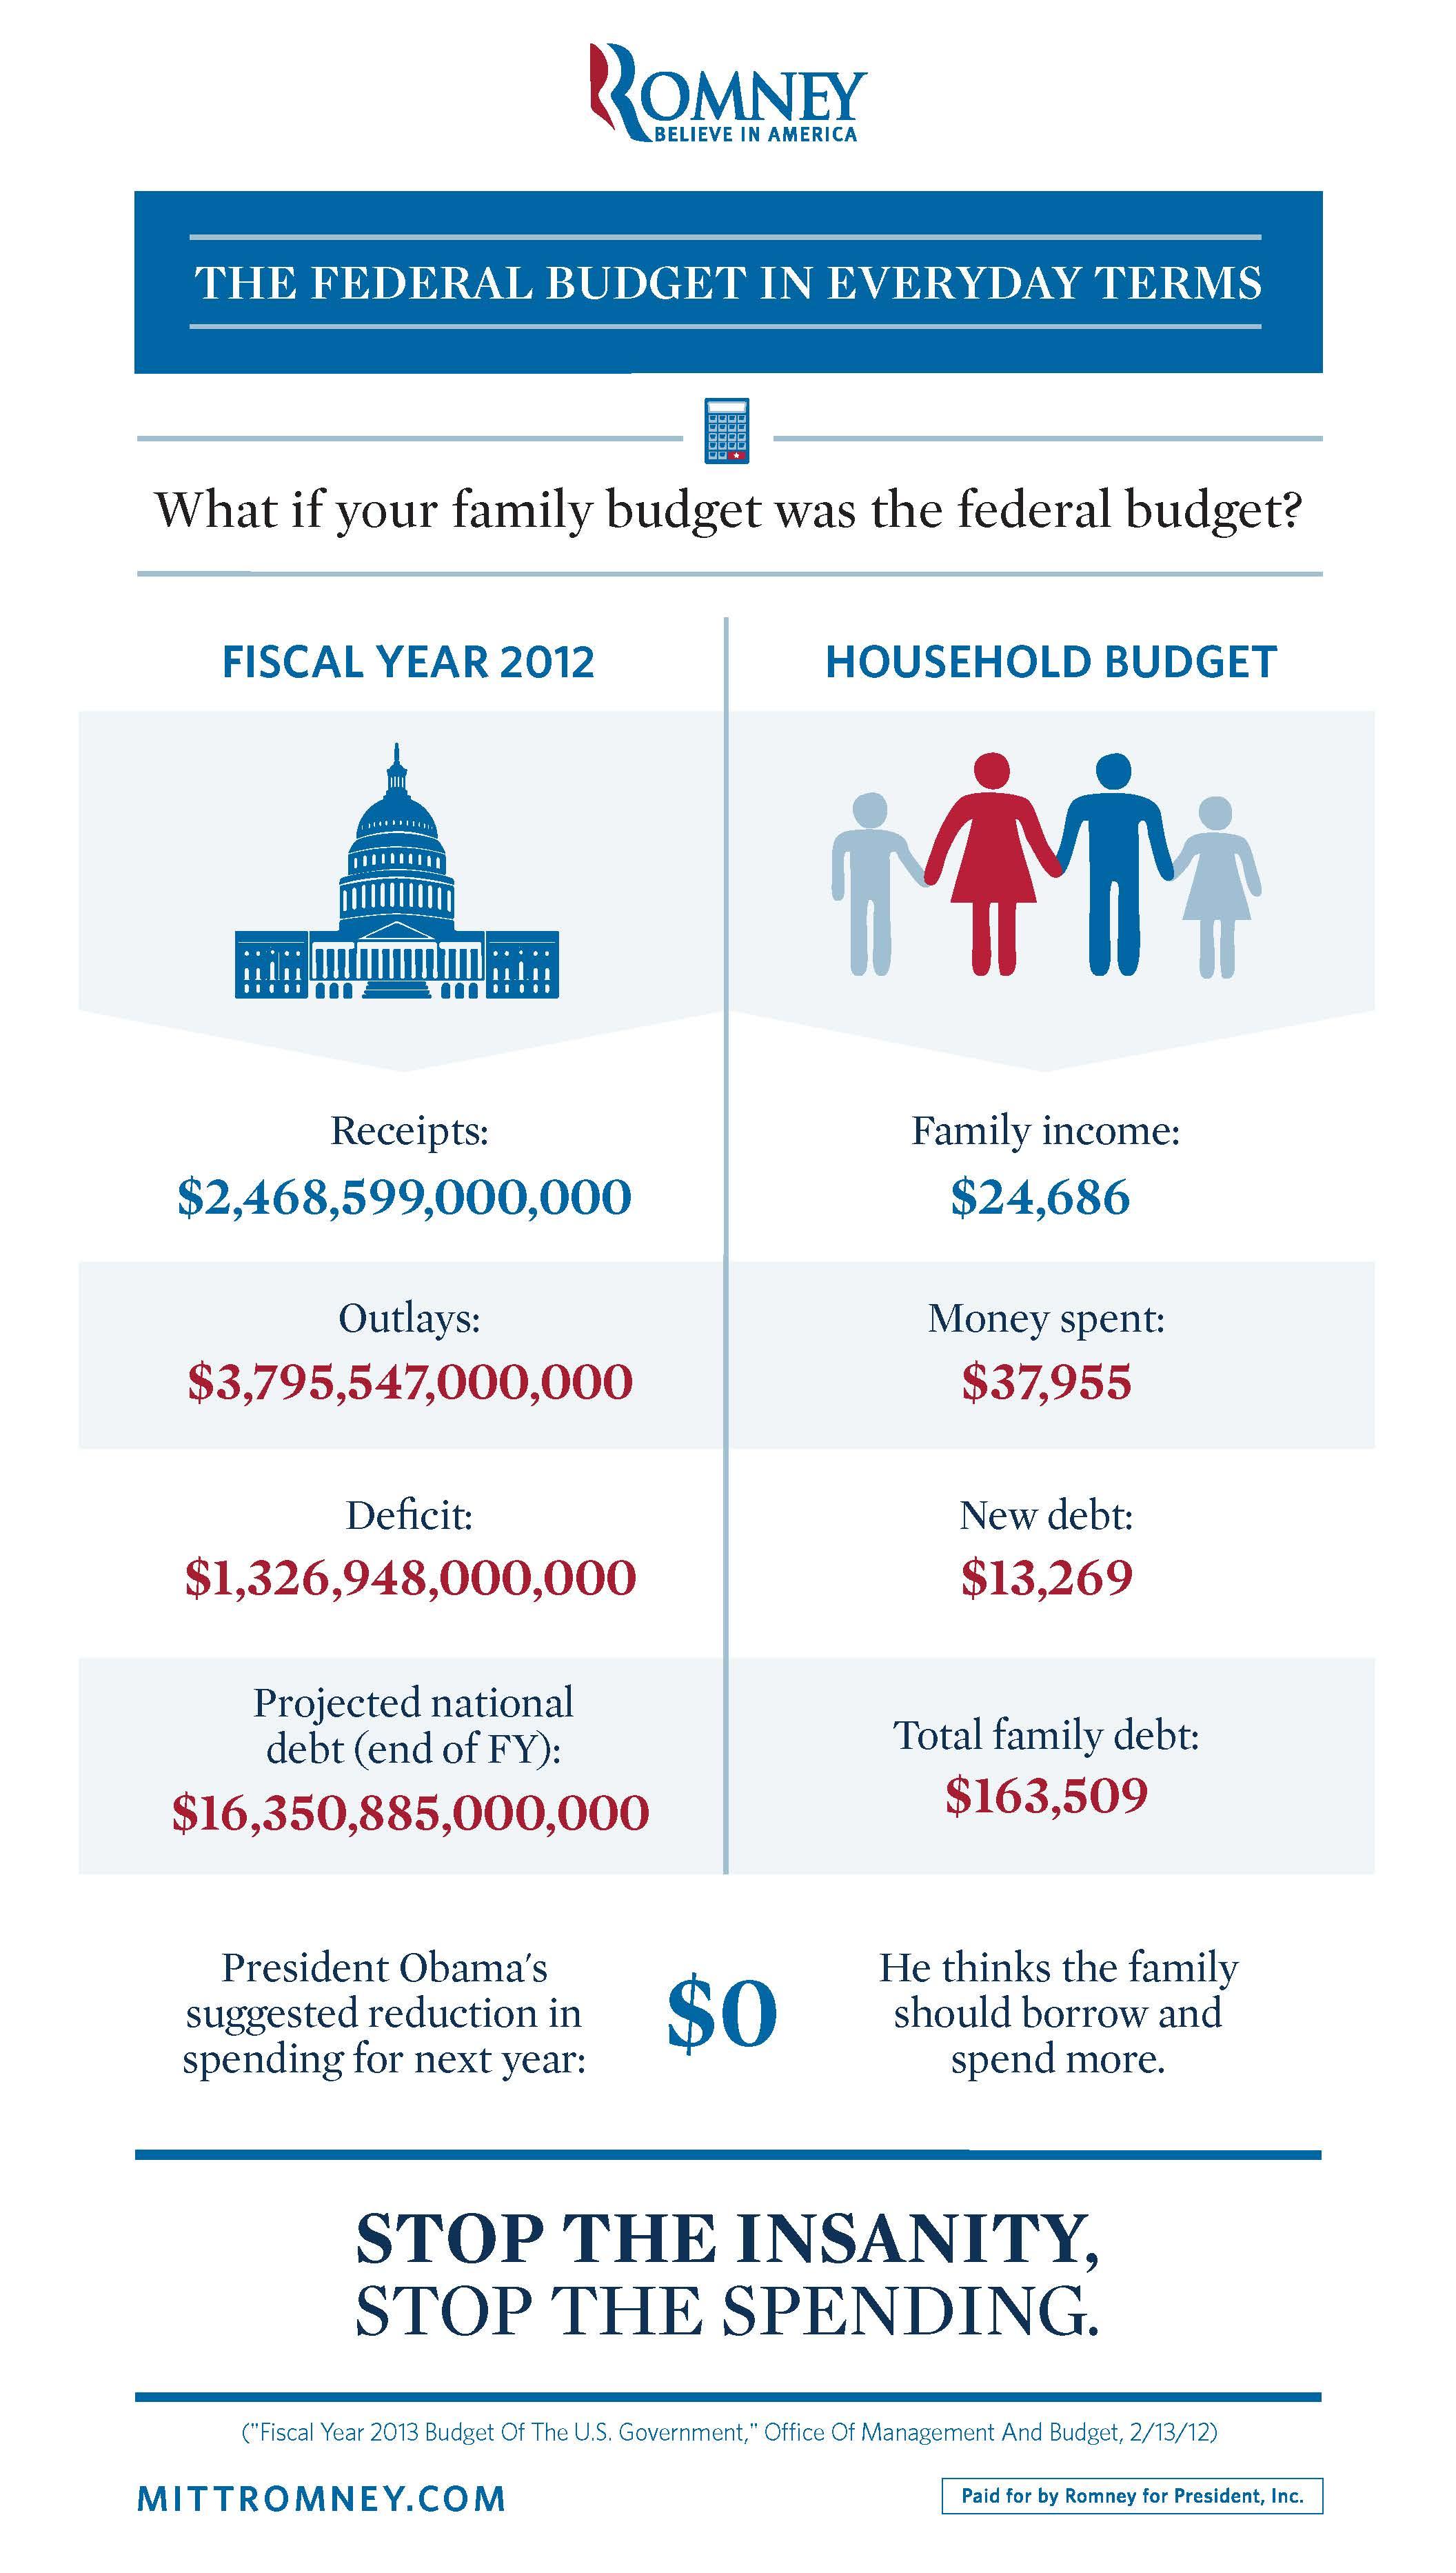 mitt romney family budget